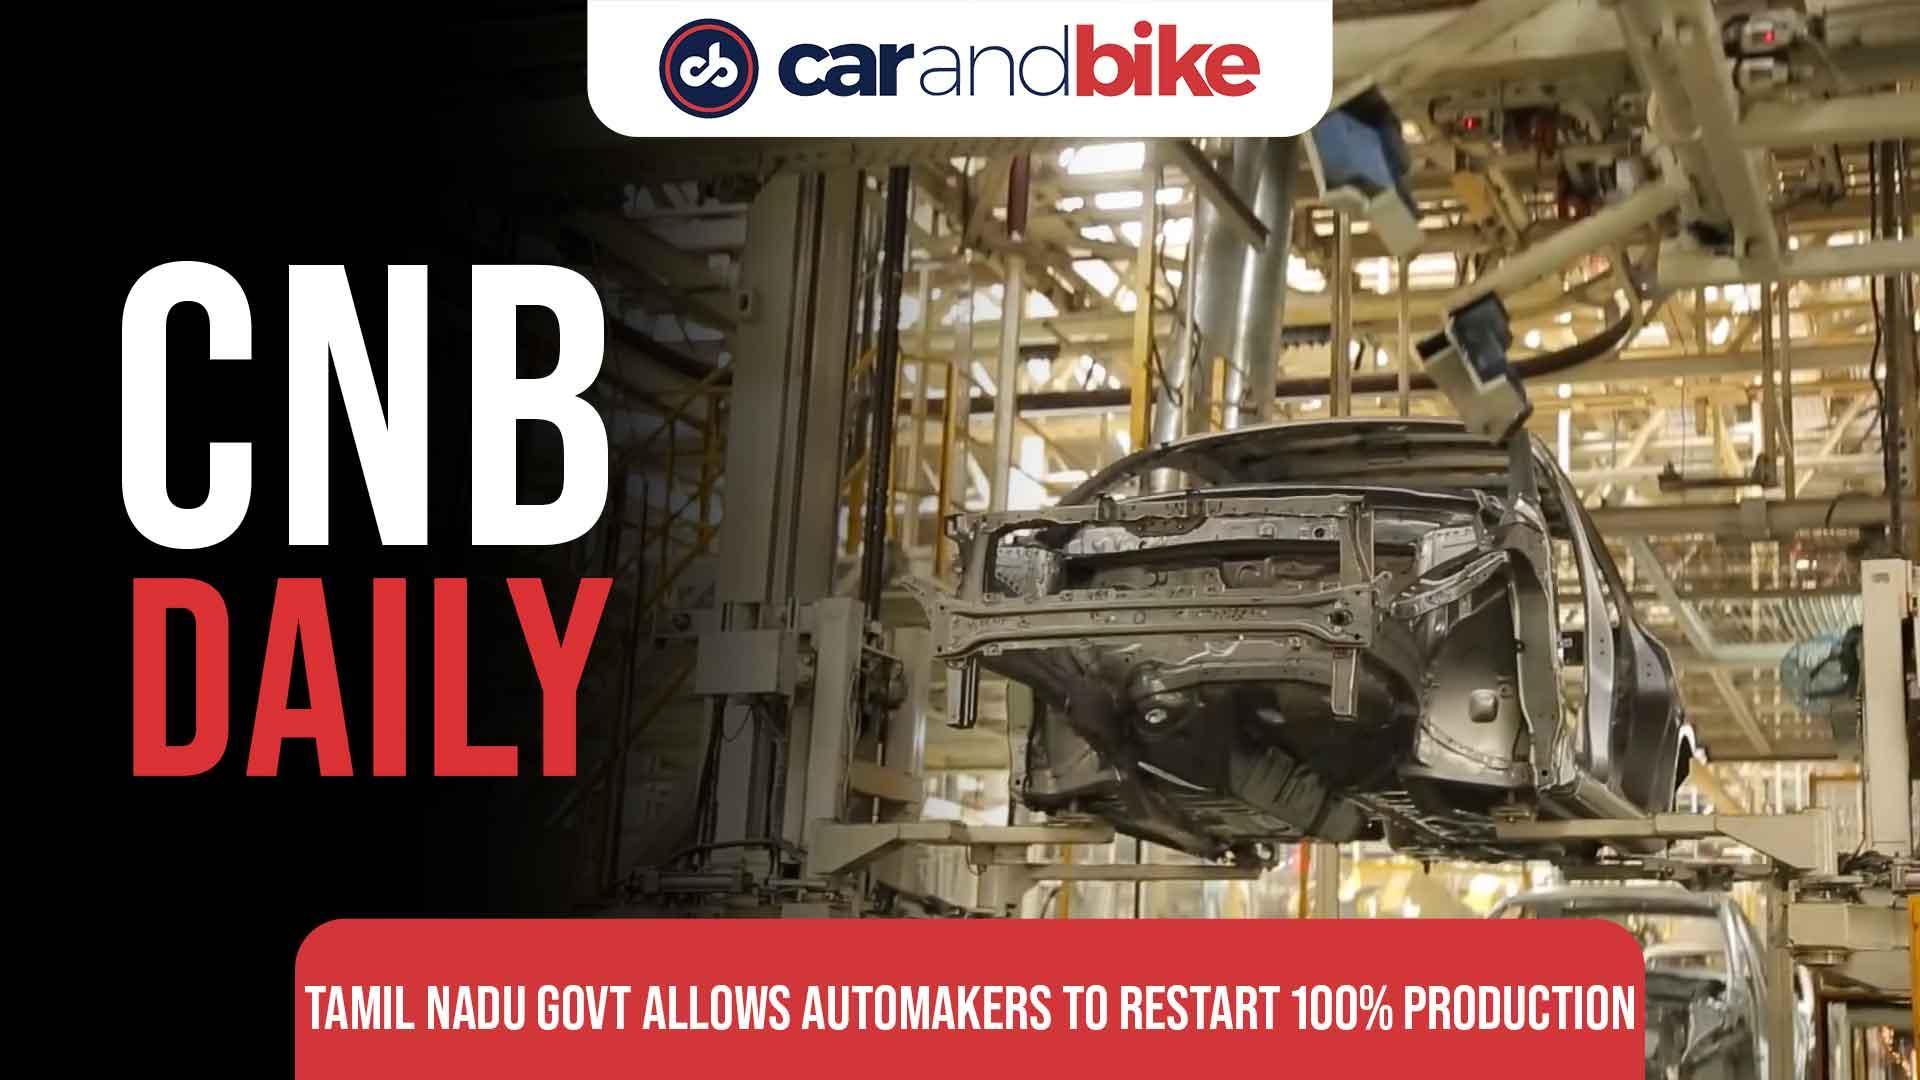 Tamil Nadu Govt. Allows Automakers To Restart Production